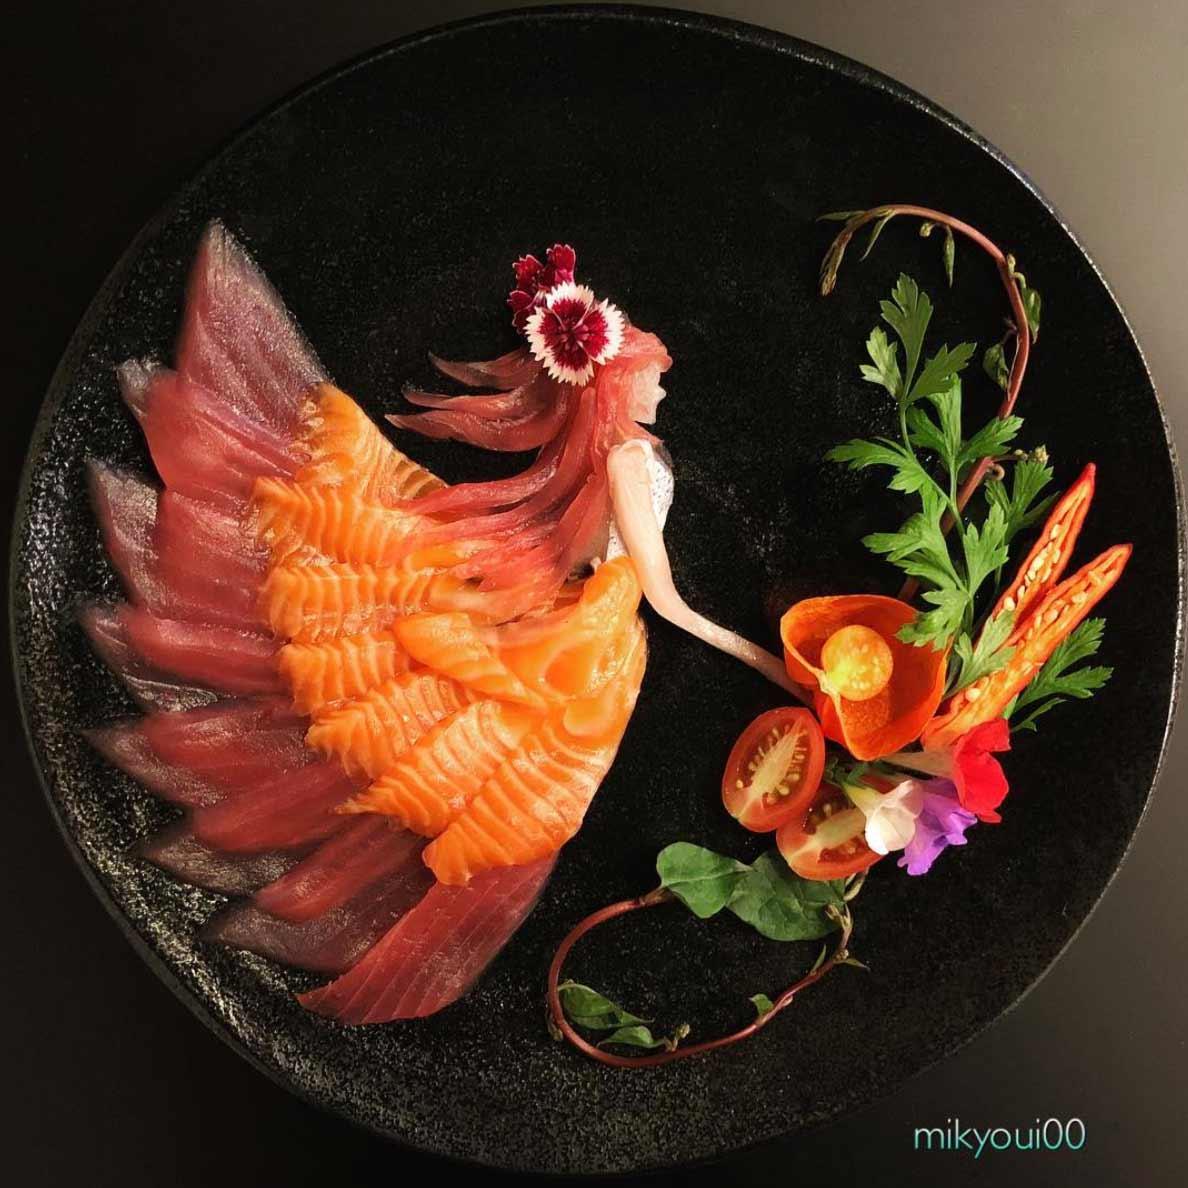 Wundervolle Sashimi-Kunstwerke von mikyou mikyou-sashimi-art-sushi-fischbilder_02